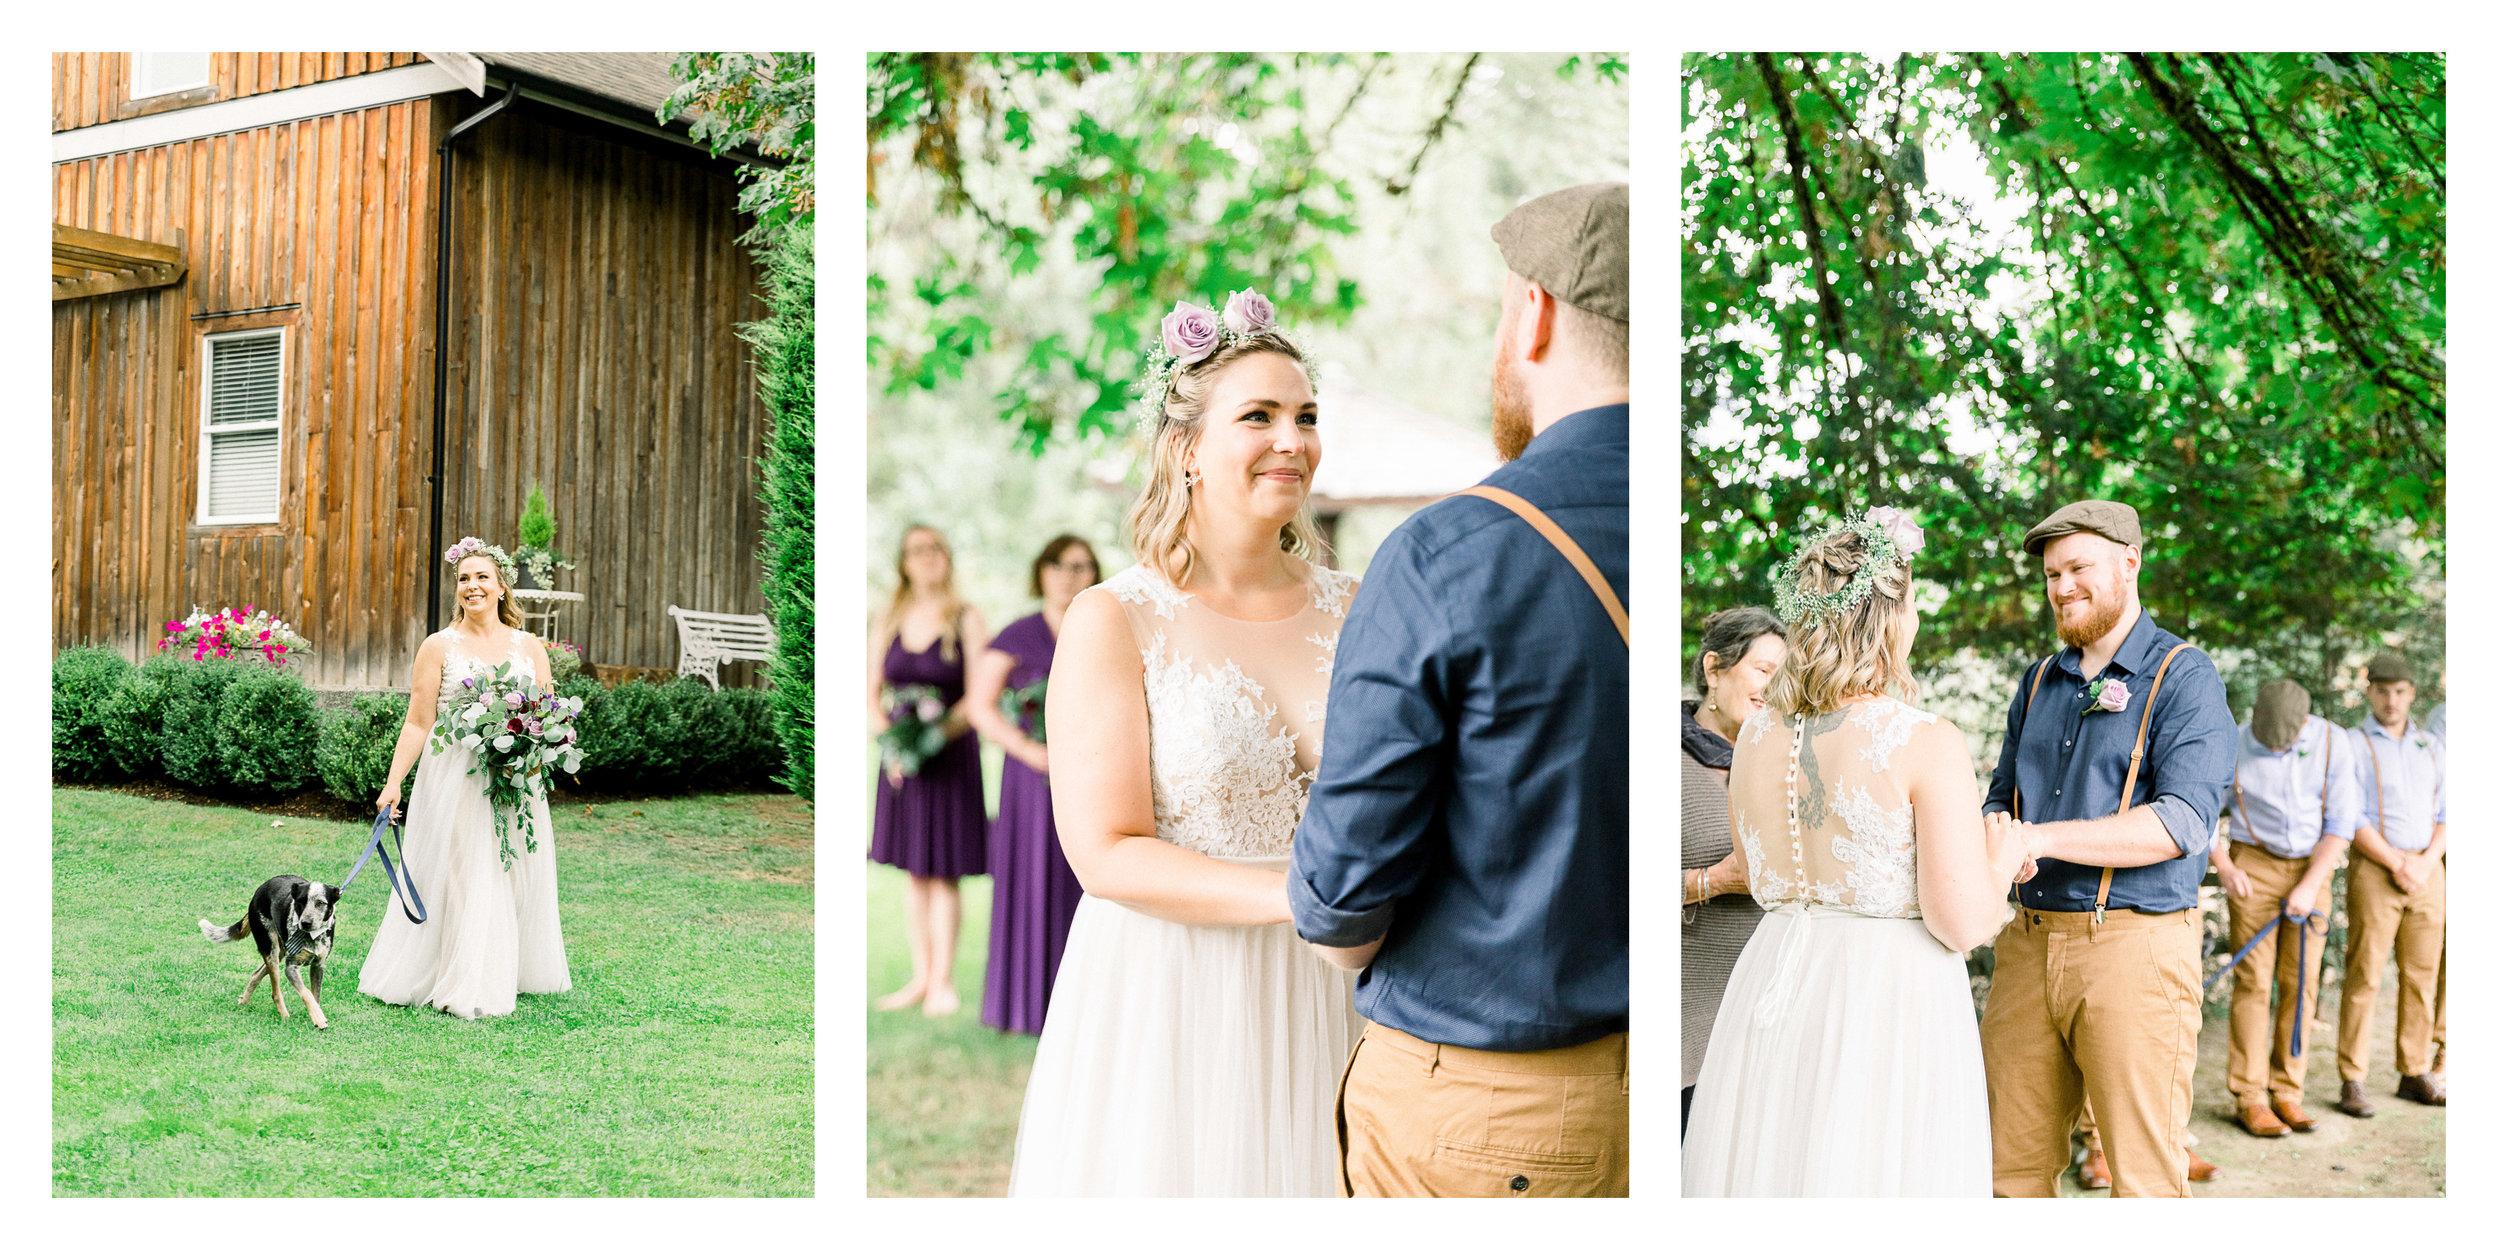 Vancouver-Wedding-Photographer-4.jpg